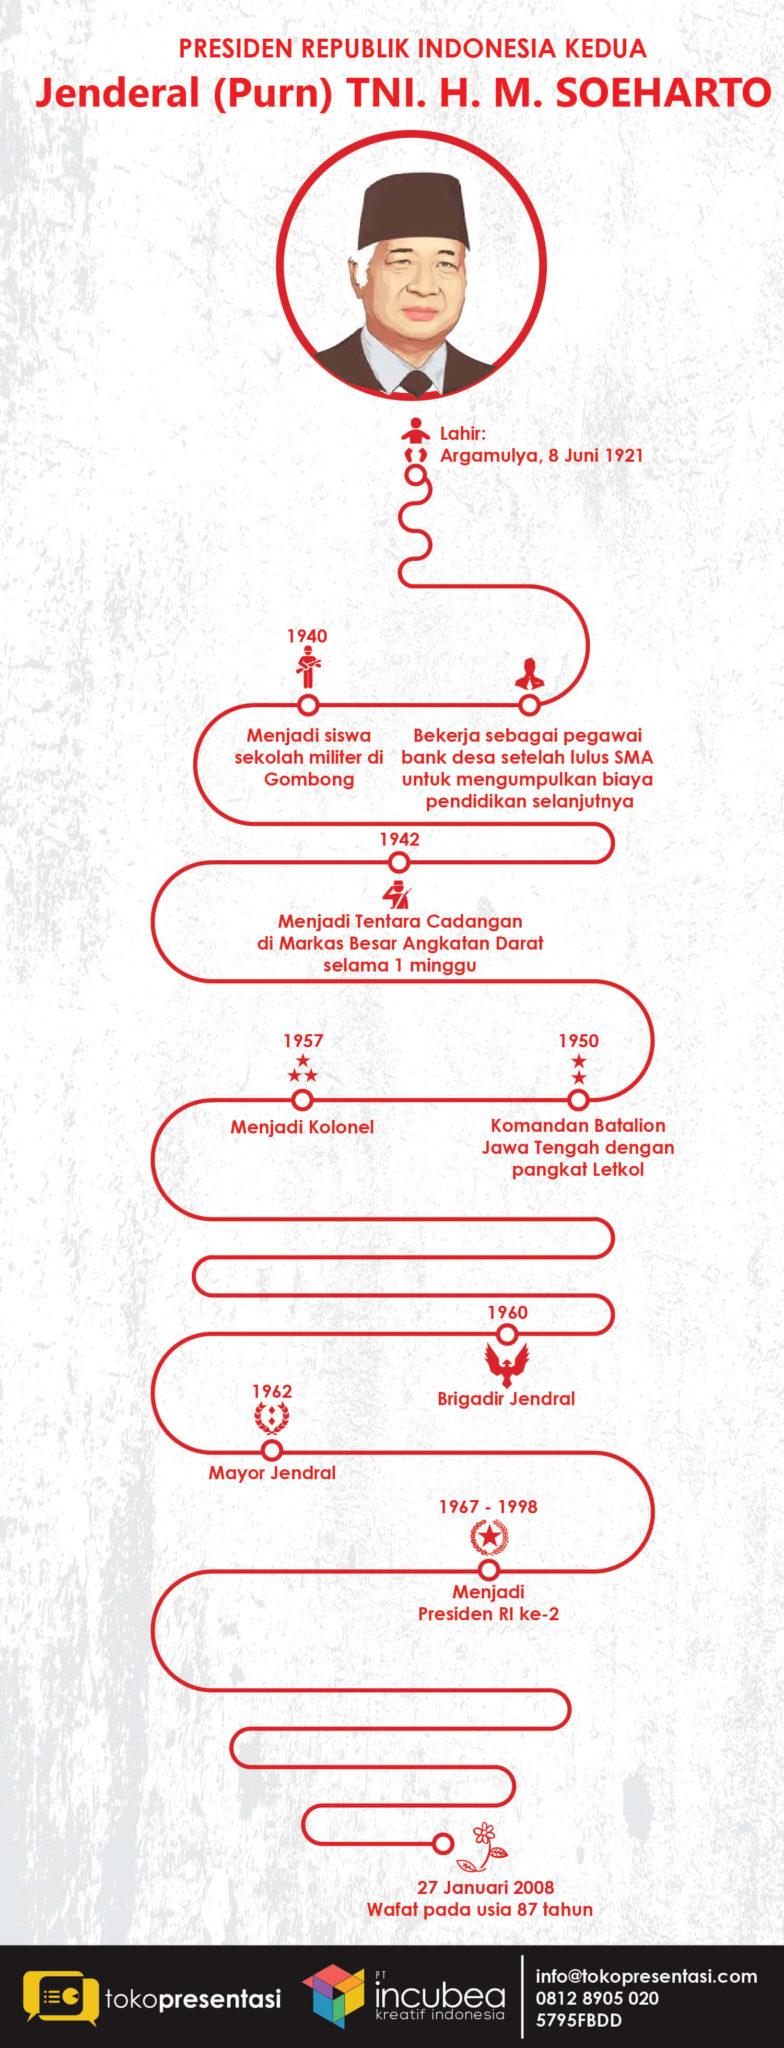 Infografis Presiden RI kedua Jenderal (Purn) TNI. H. M. SOEHARTO jasa infografis tokopresentasi-06